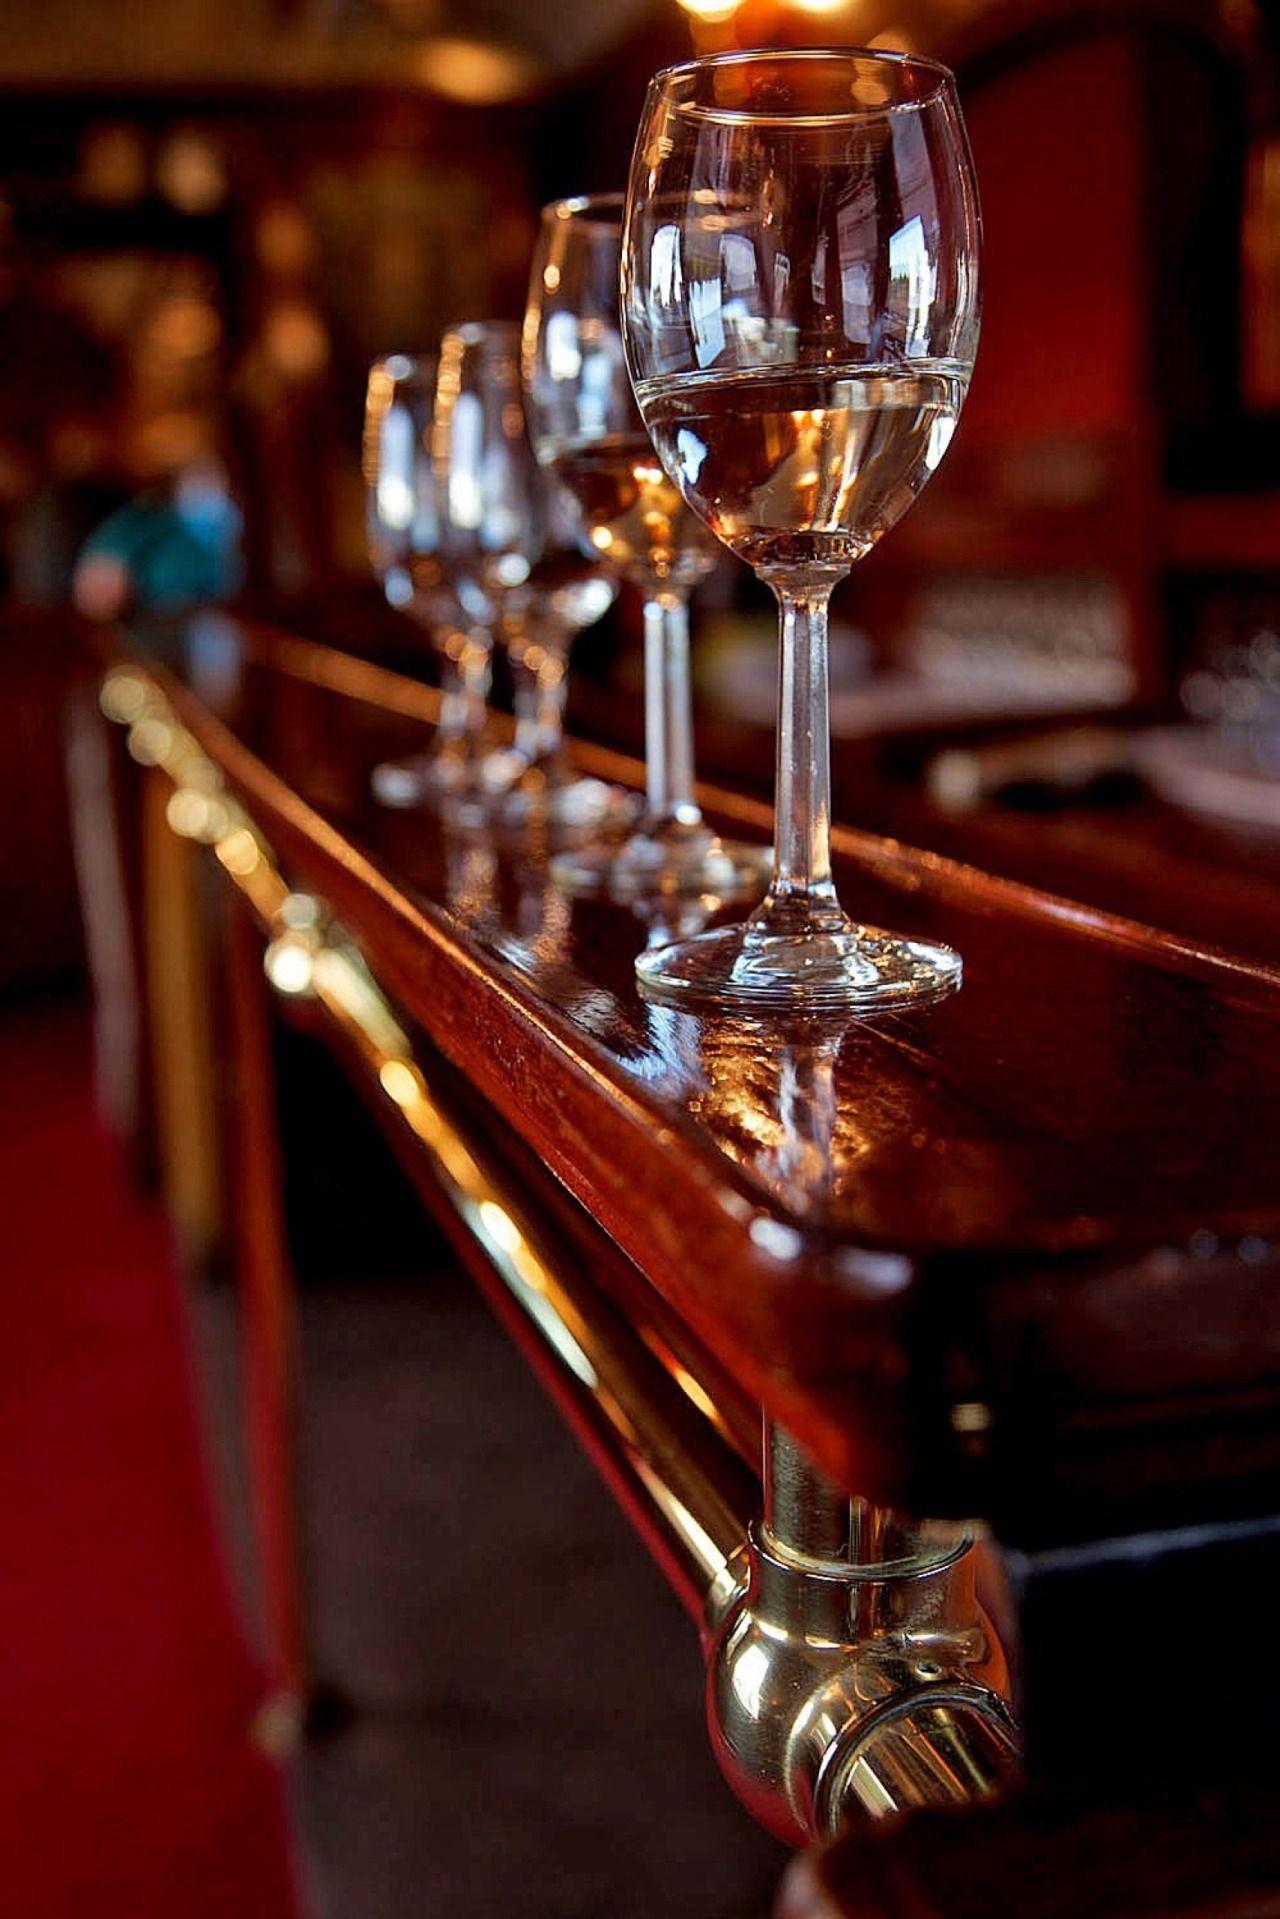 Pin By Joanne Doyle On Champagne Wine Train Wine Glass